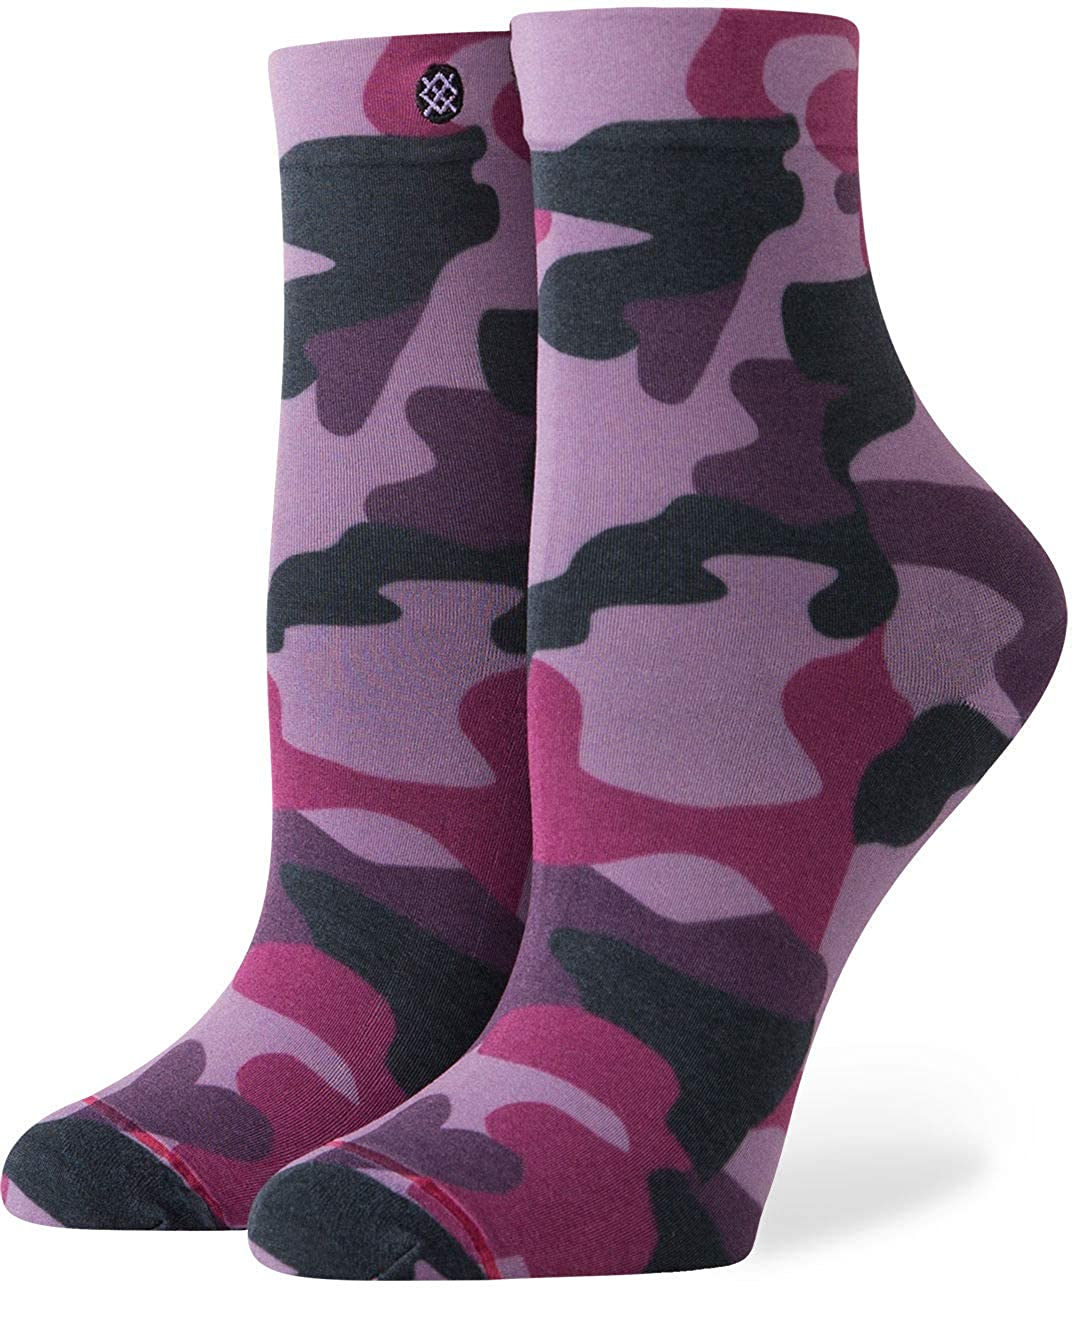 Stance W315C18APR Women's Aphrodite Sock Purple - OS (6-10) Stance Socks Anklet - Aphrodite